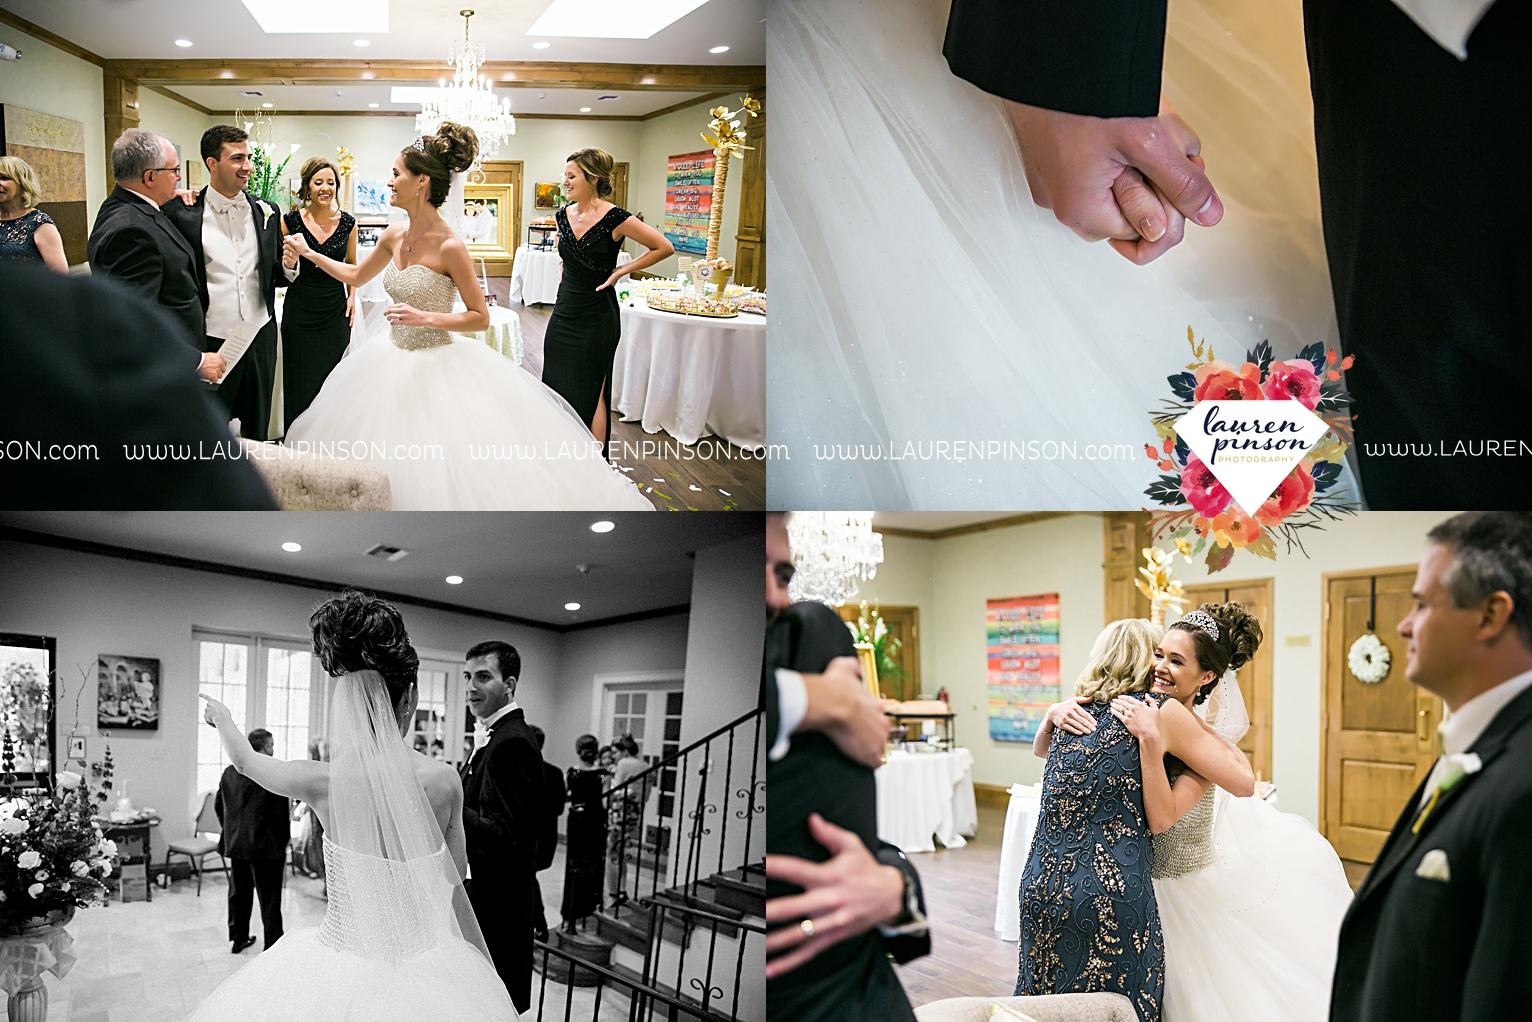 wichita-falls-texas-wedding-photographer-the-forum-by-the-kemp-mayfield-events-ulta-gold-glitter_2871.jpg